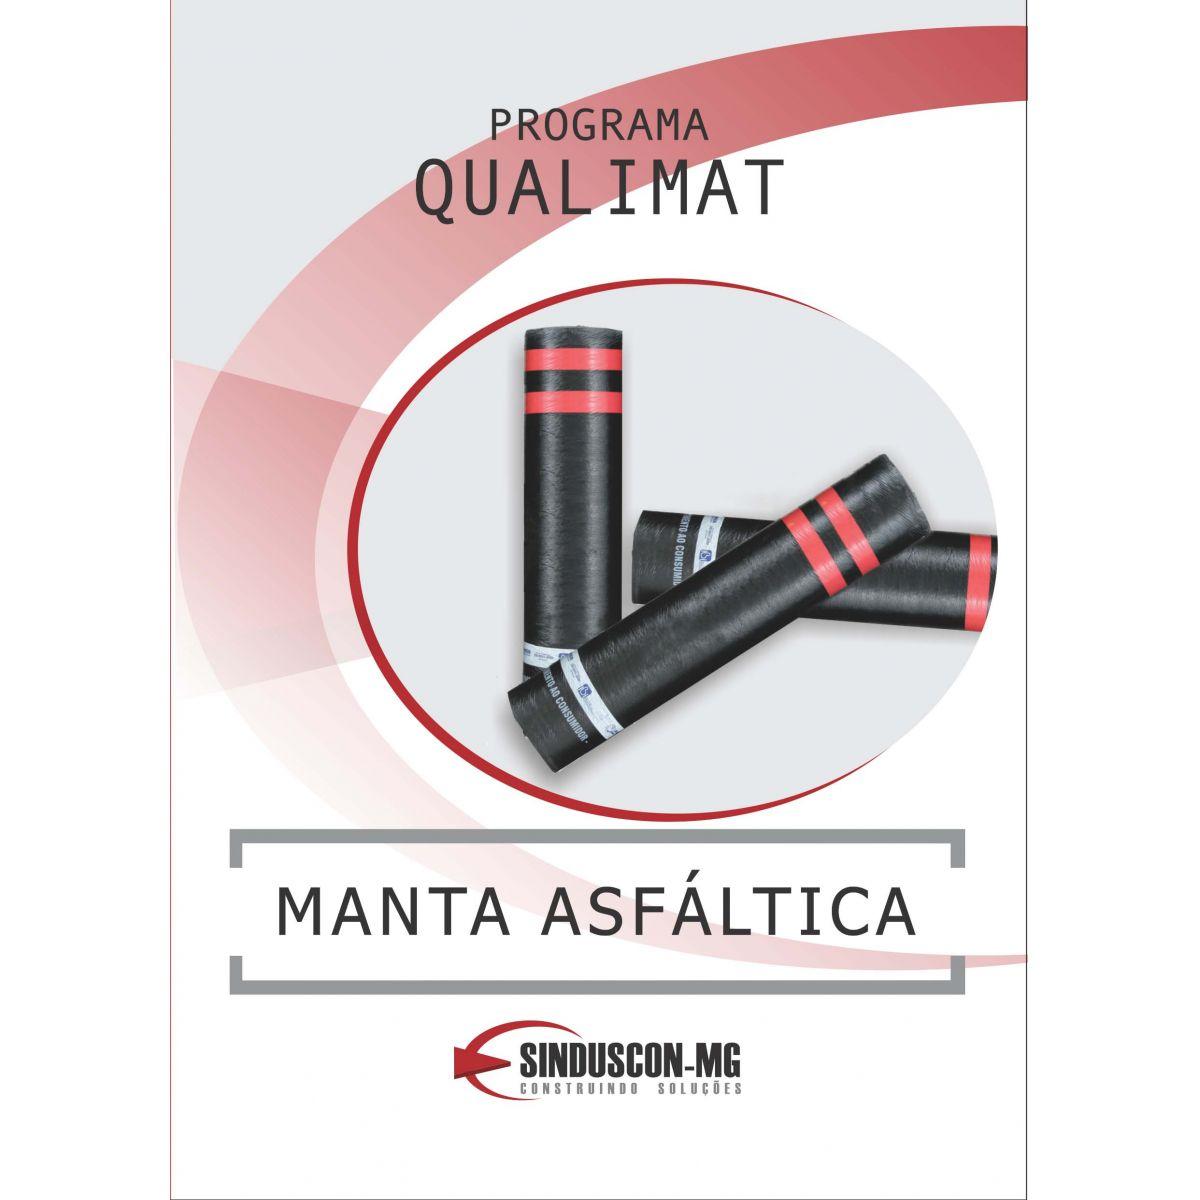 Programa Qualimat - Manta Asfáltica